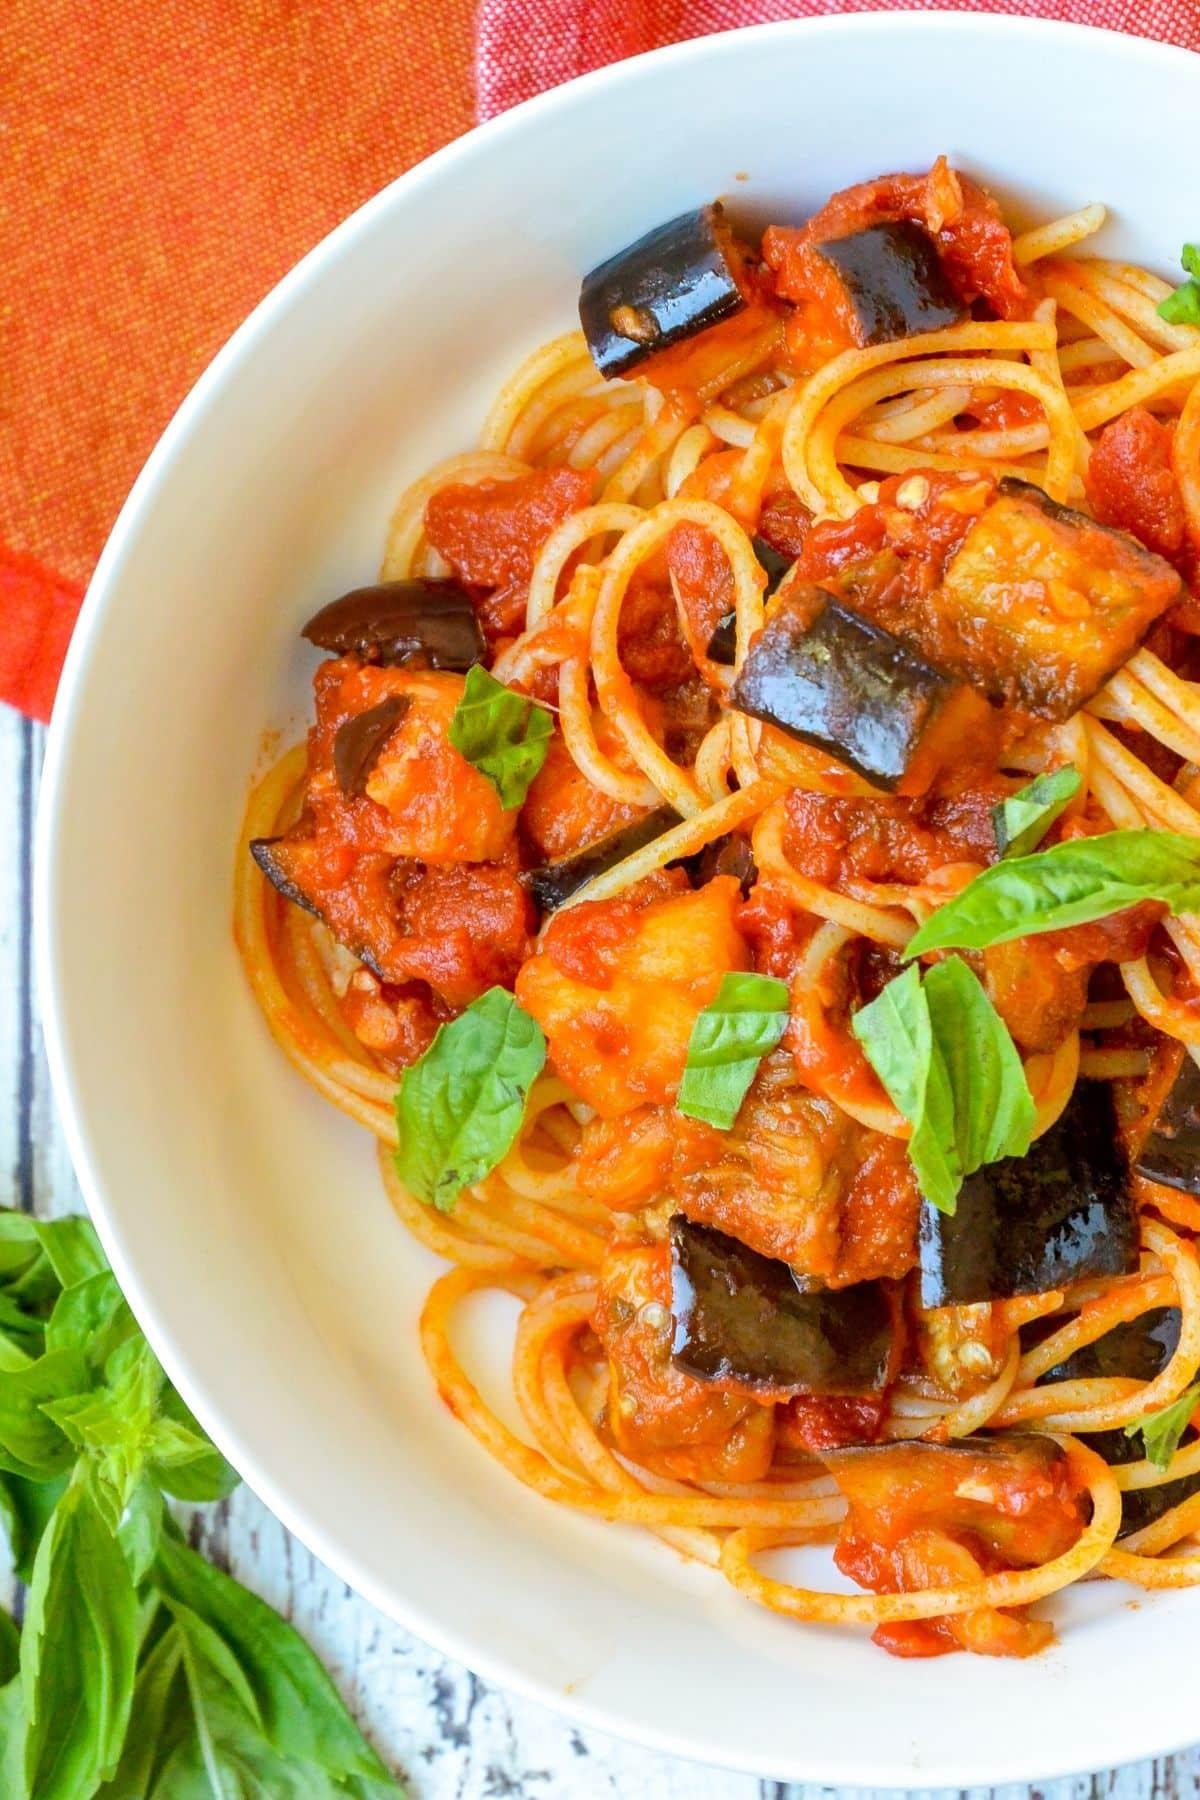 Close up of finished pasta recipe garnished with fresh basil